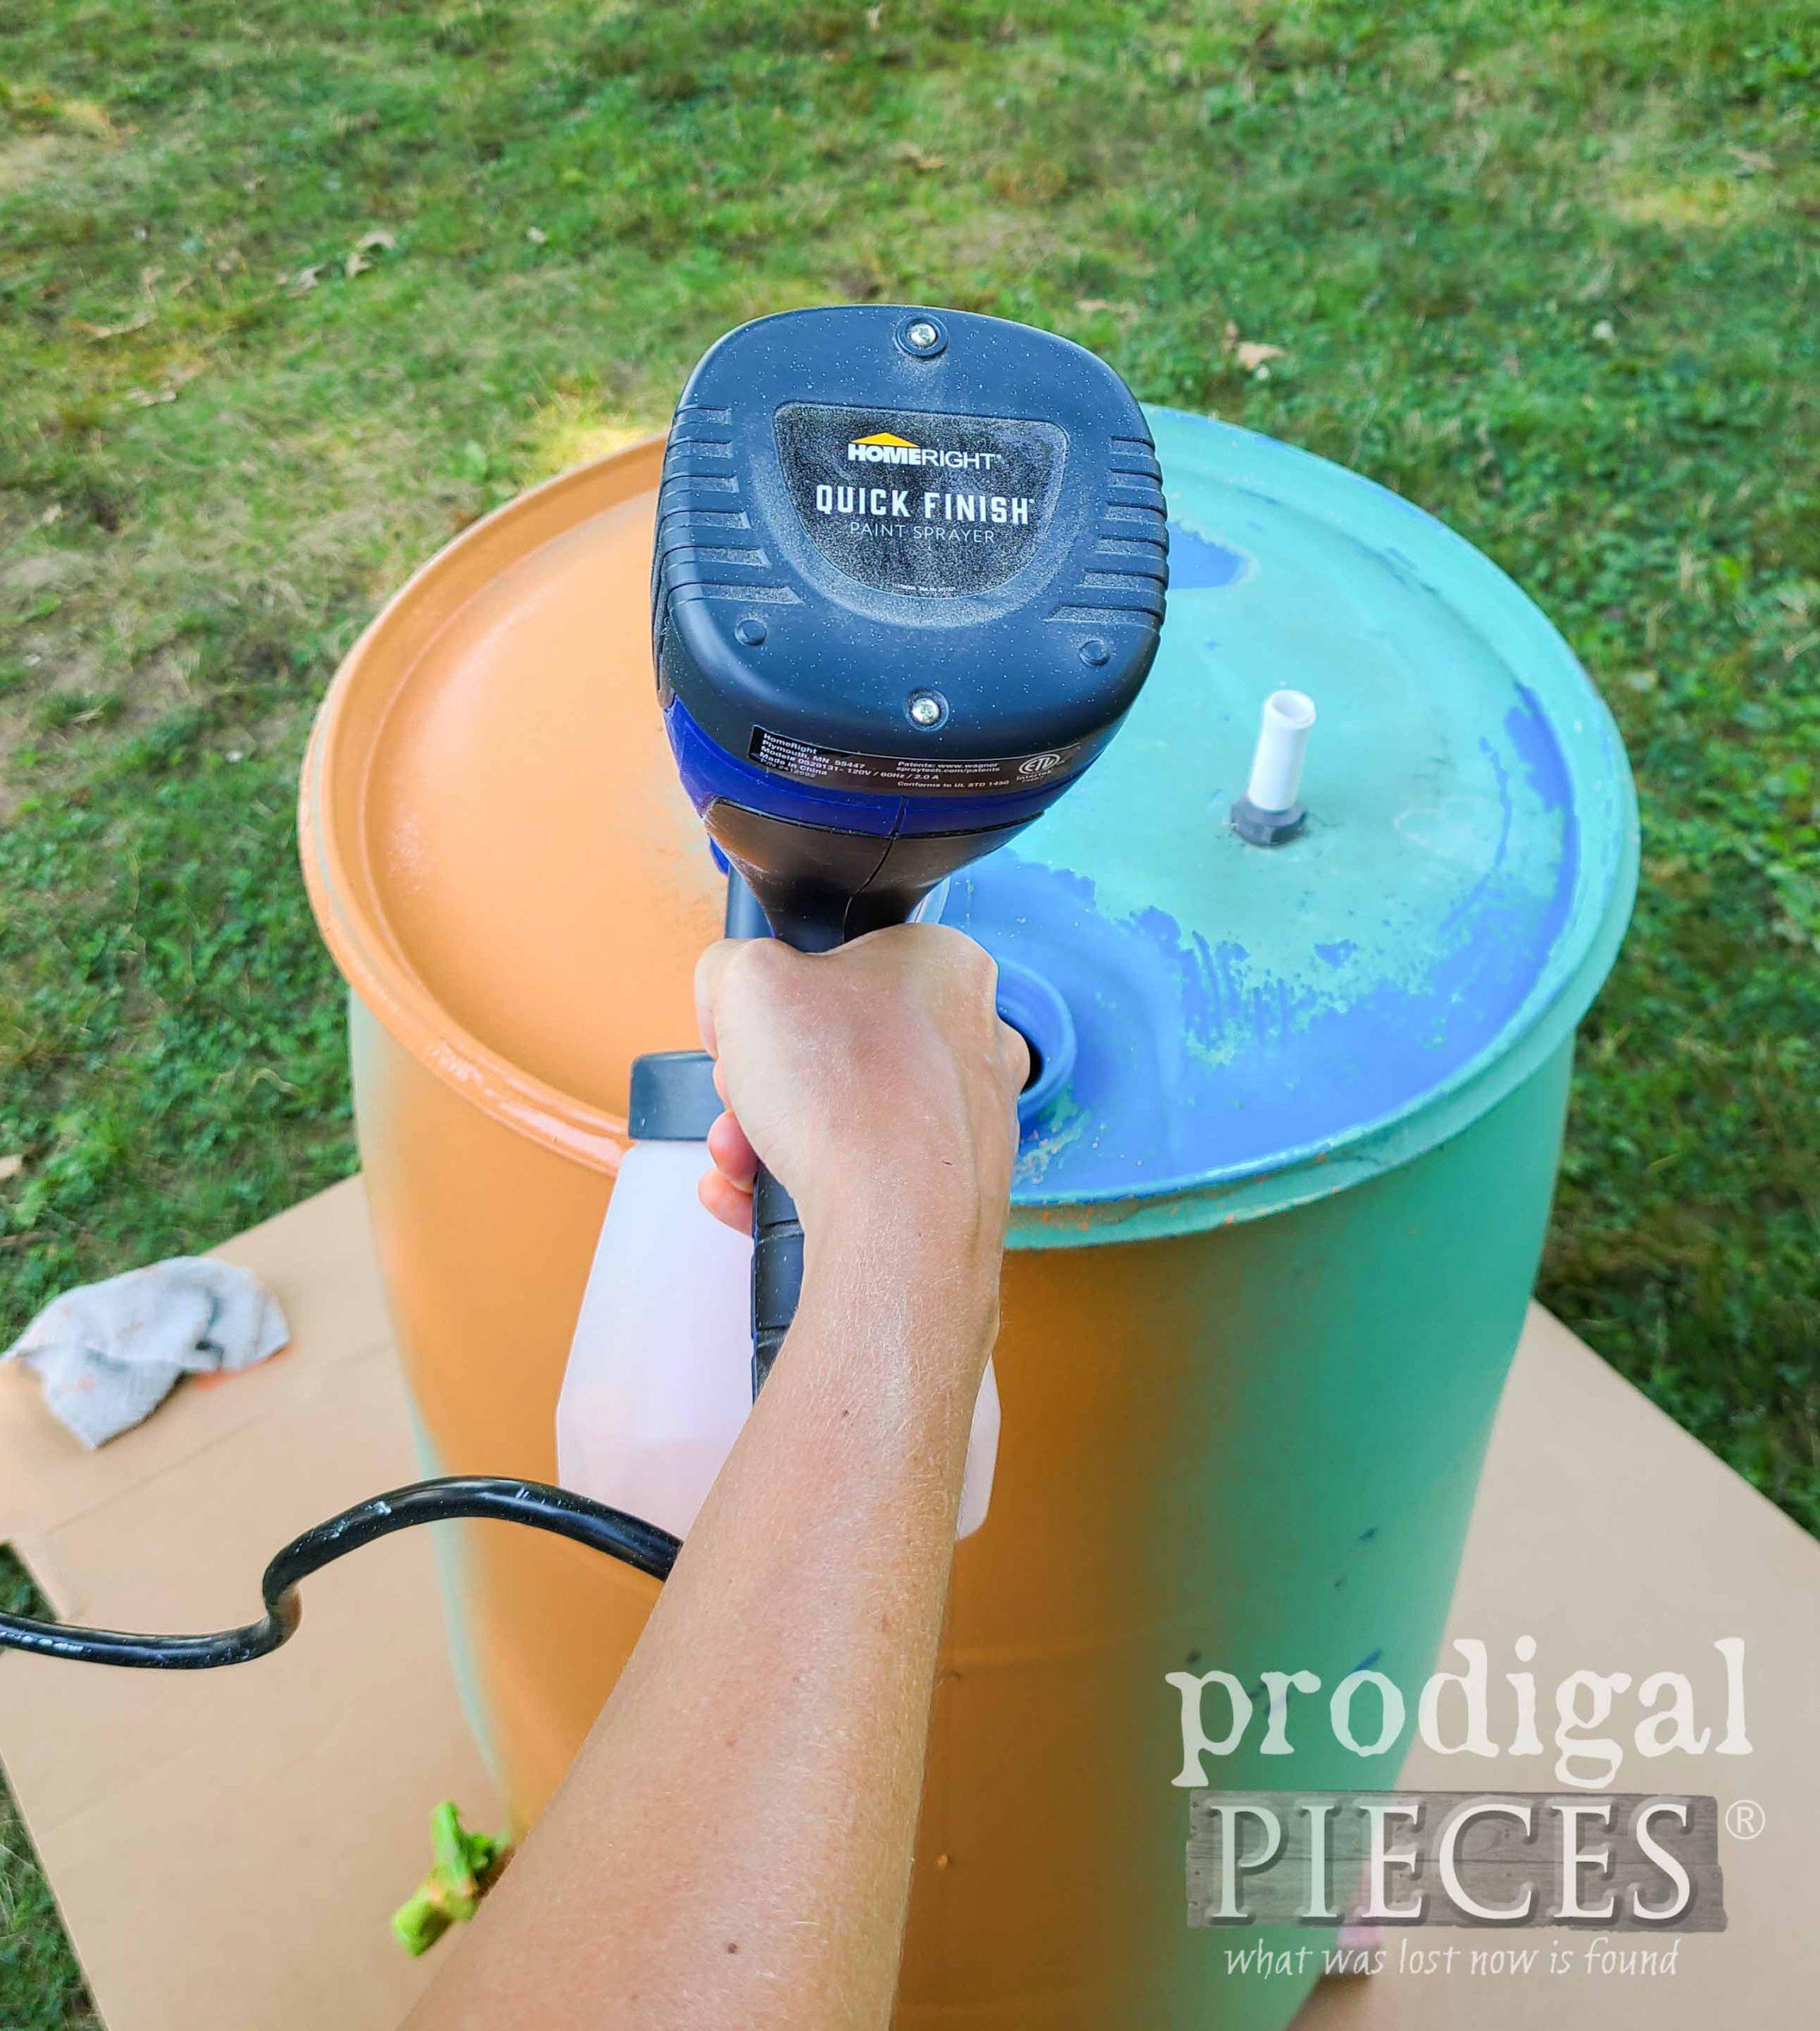 HomeRight Quick Finish Paint Sprayer for DIY Rain Barrel by Prodigal Pieces | prodigalpieces.com